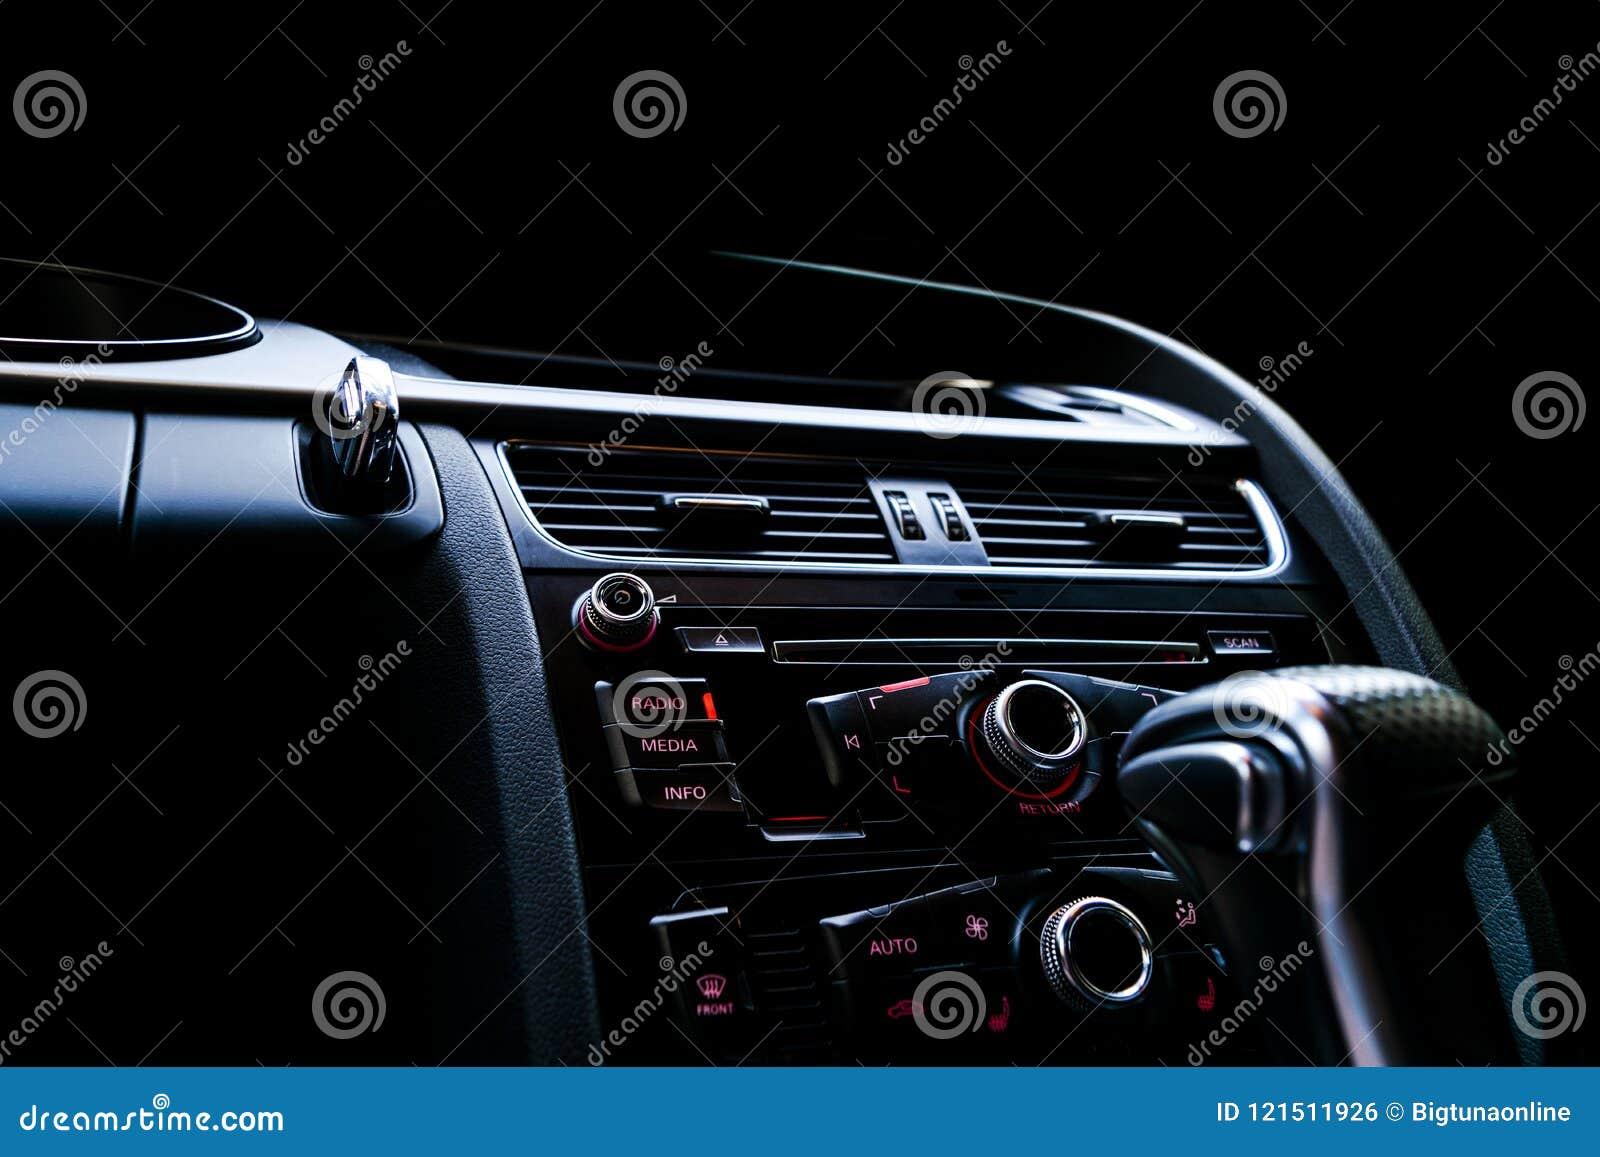 Coche deportivo de lujo moderno dentro Interior del coche del prestigio Cuero negro Detalle del coche dashboard Medios, clima y n